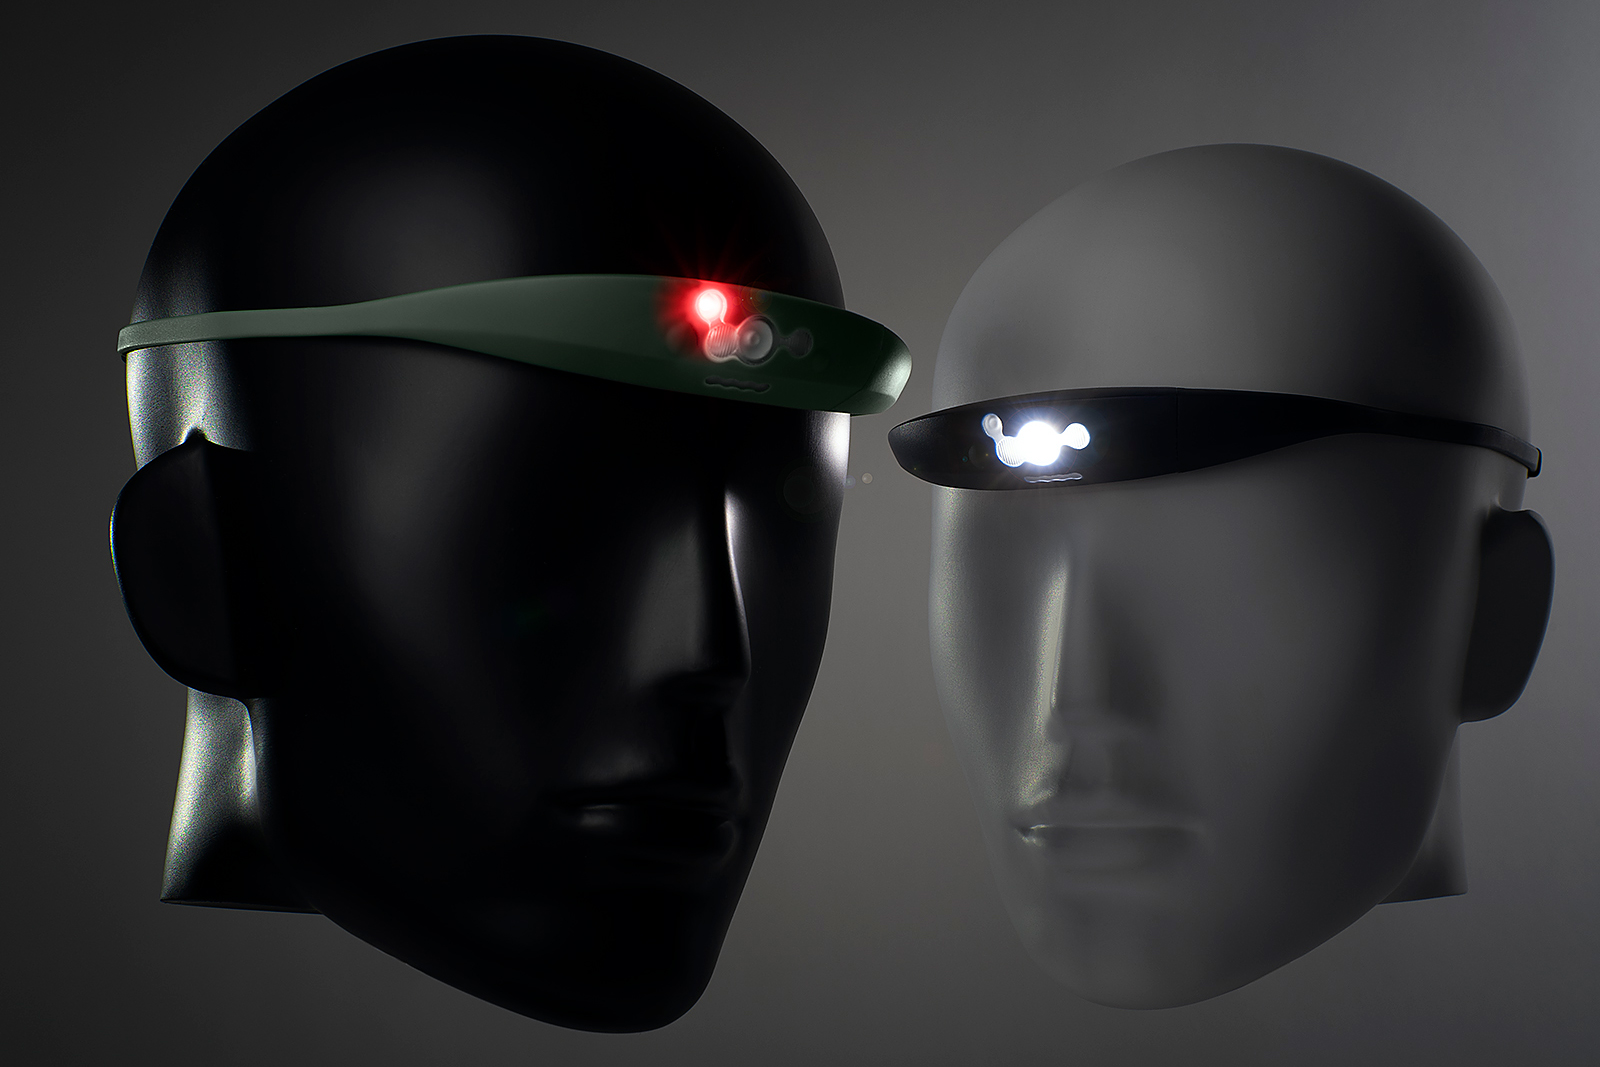 Knog Bandicoot headlamp